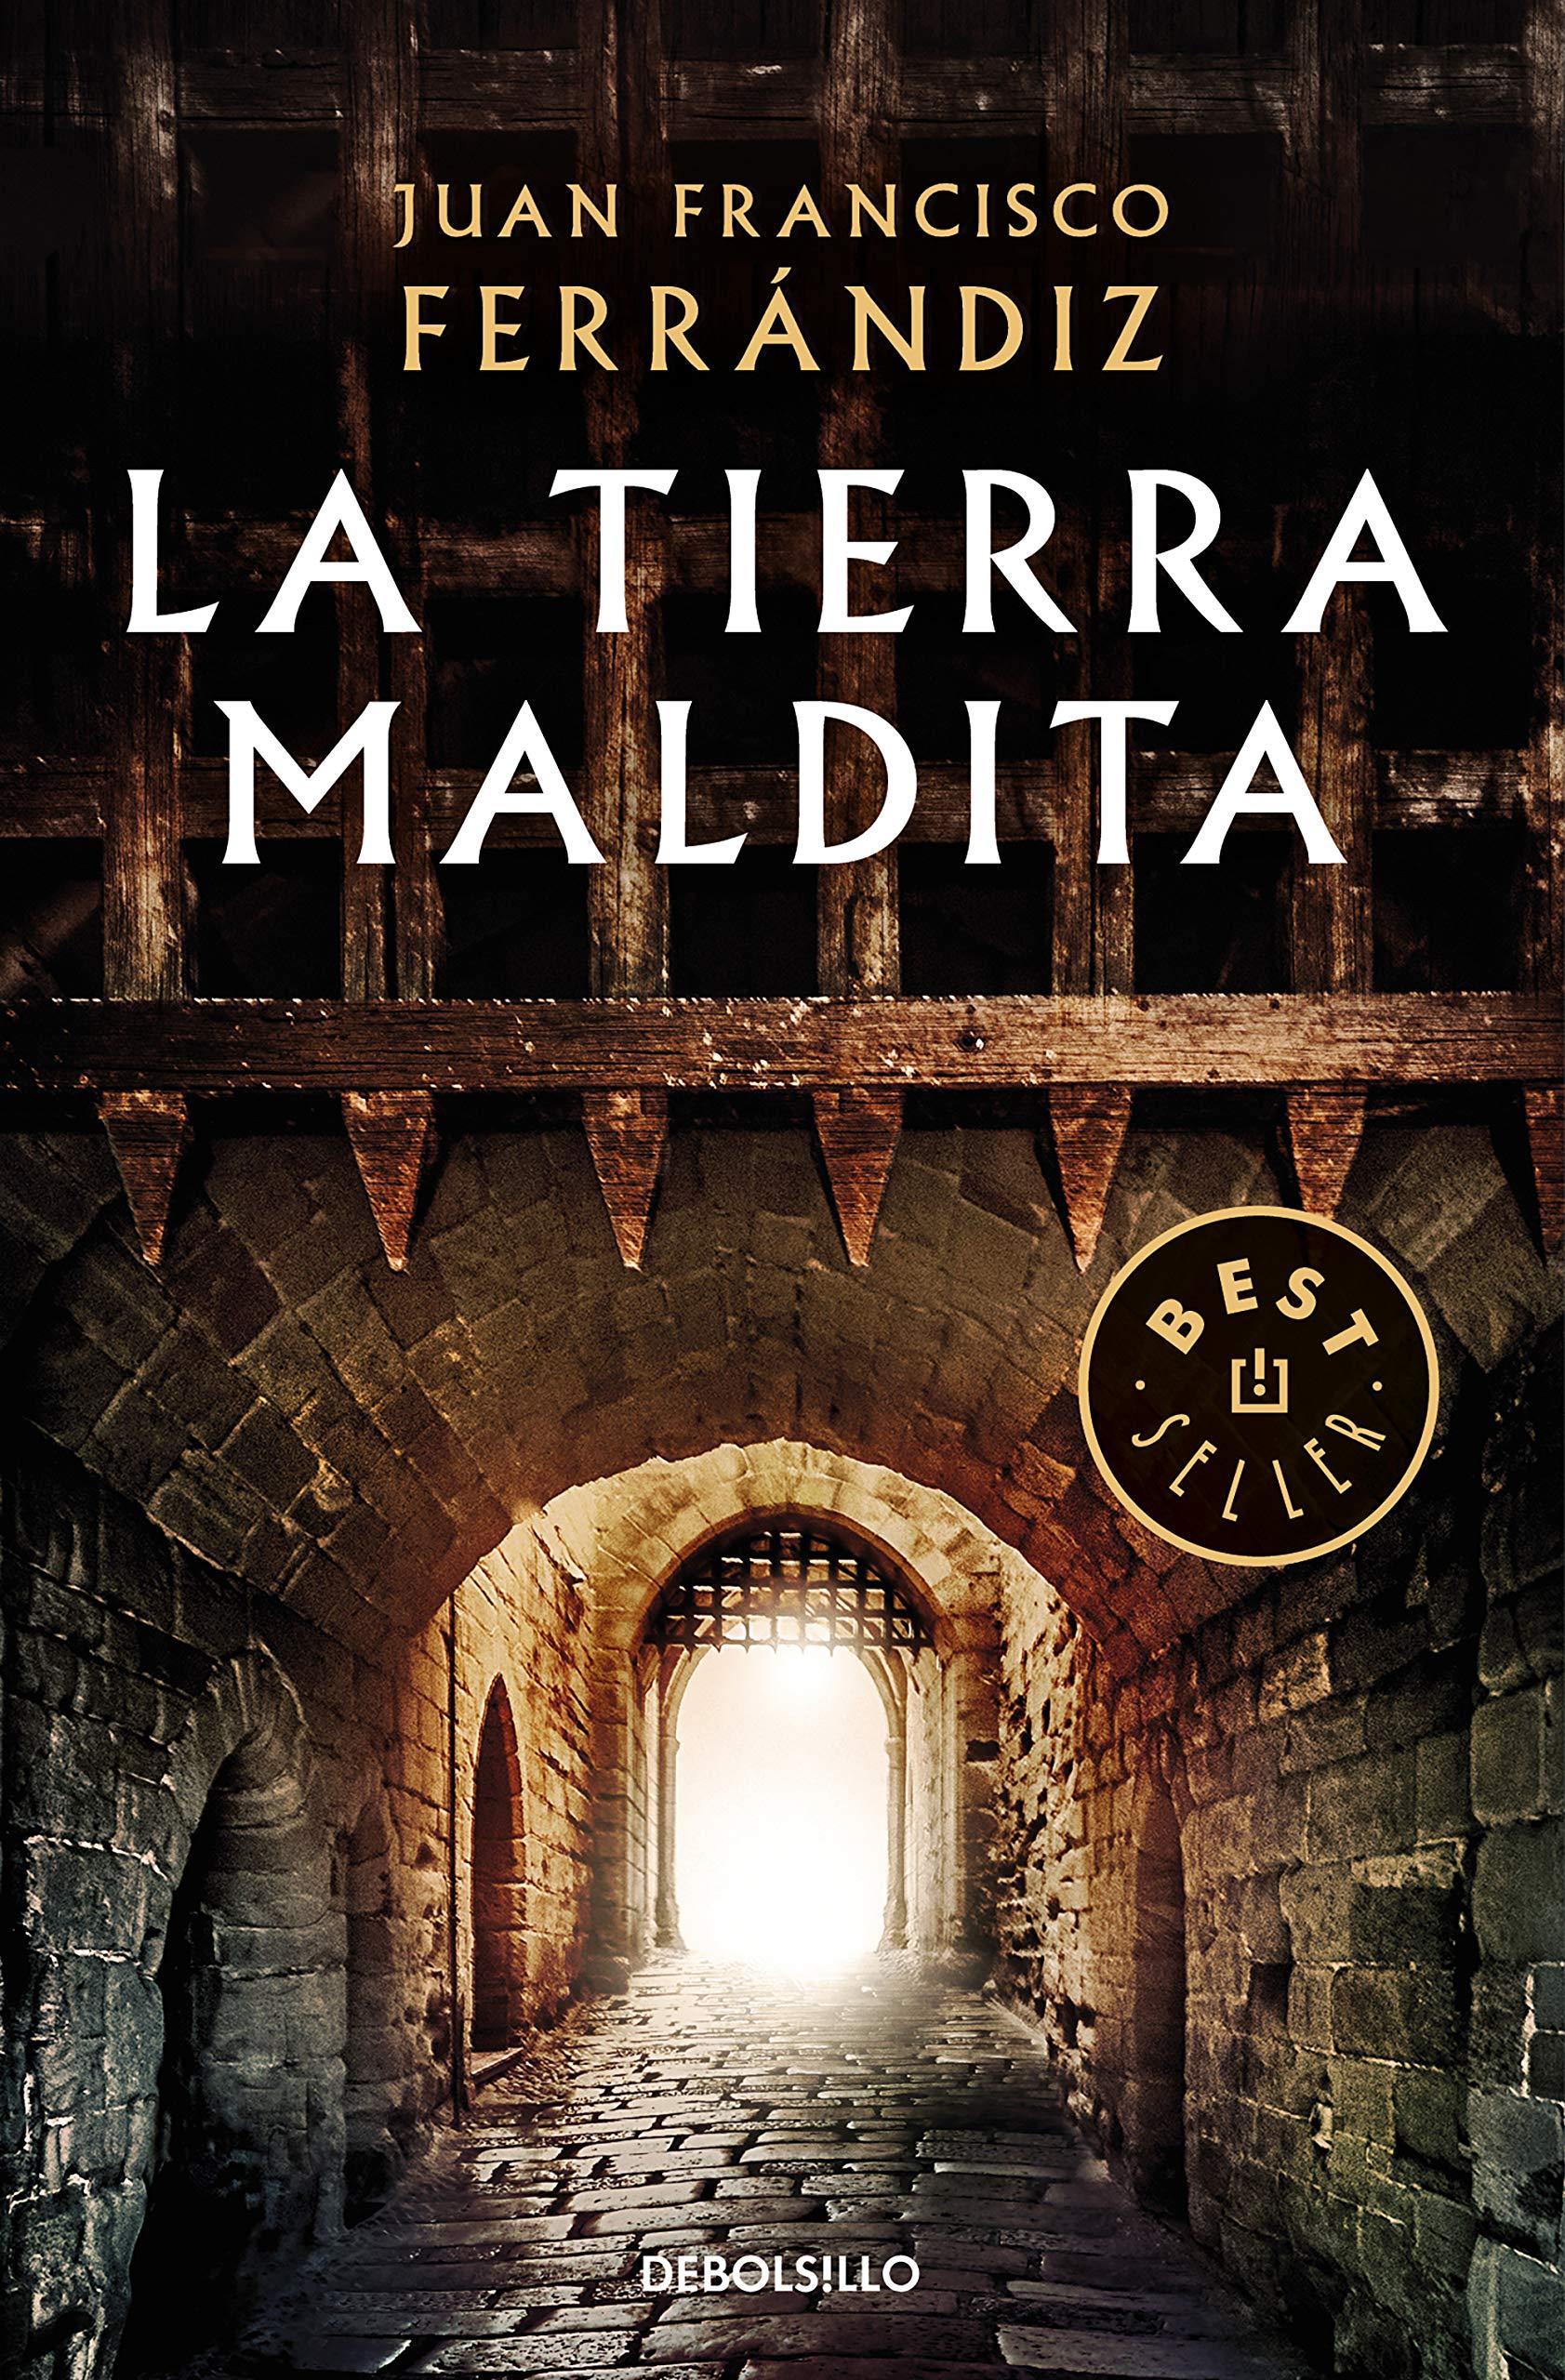 La tierra maldita (Best Seller): Amazon.es: Ferrándiz, Juan Francisco: Libros